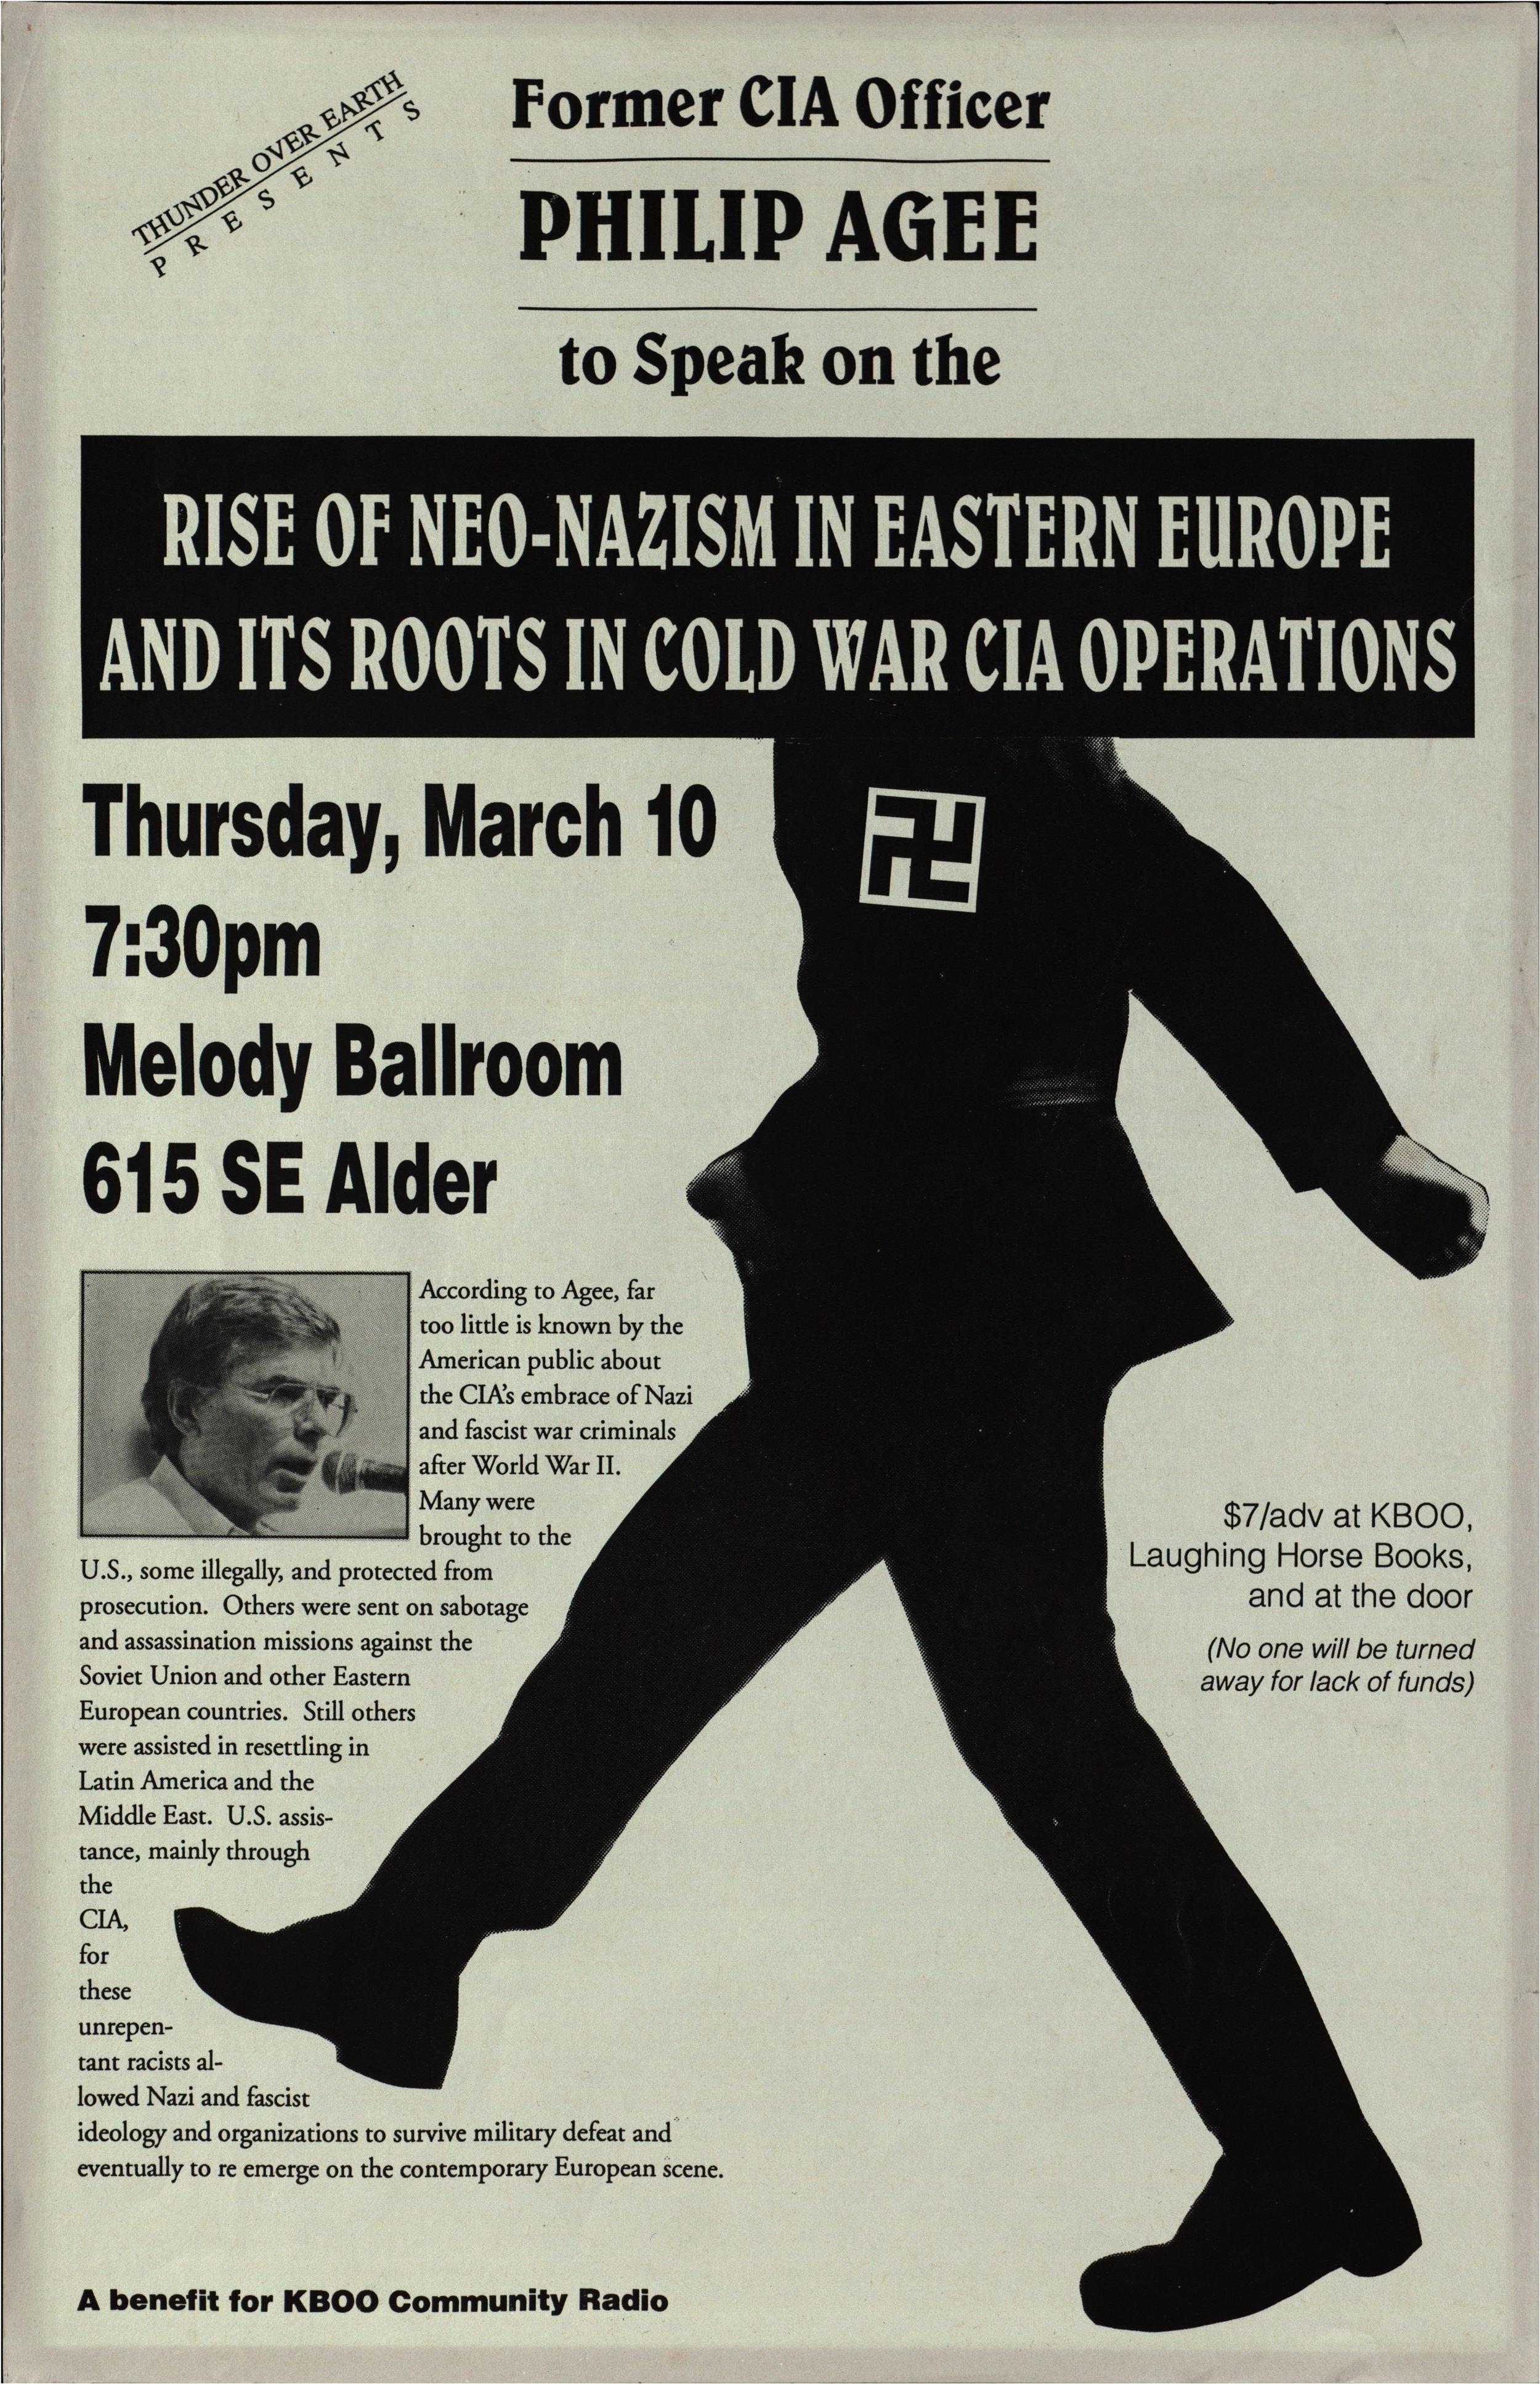 KBOO_Posters_OS_Philip_Agee_Talk_CIA_Neo_Nazi.jpg